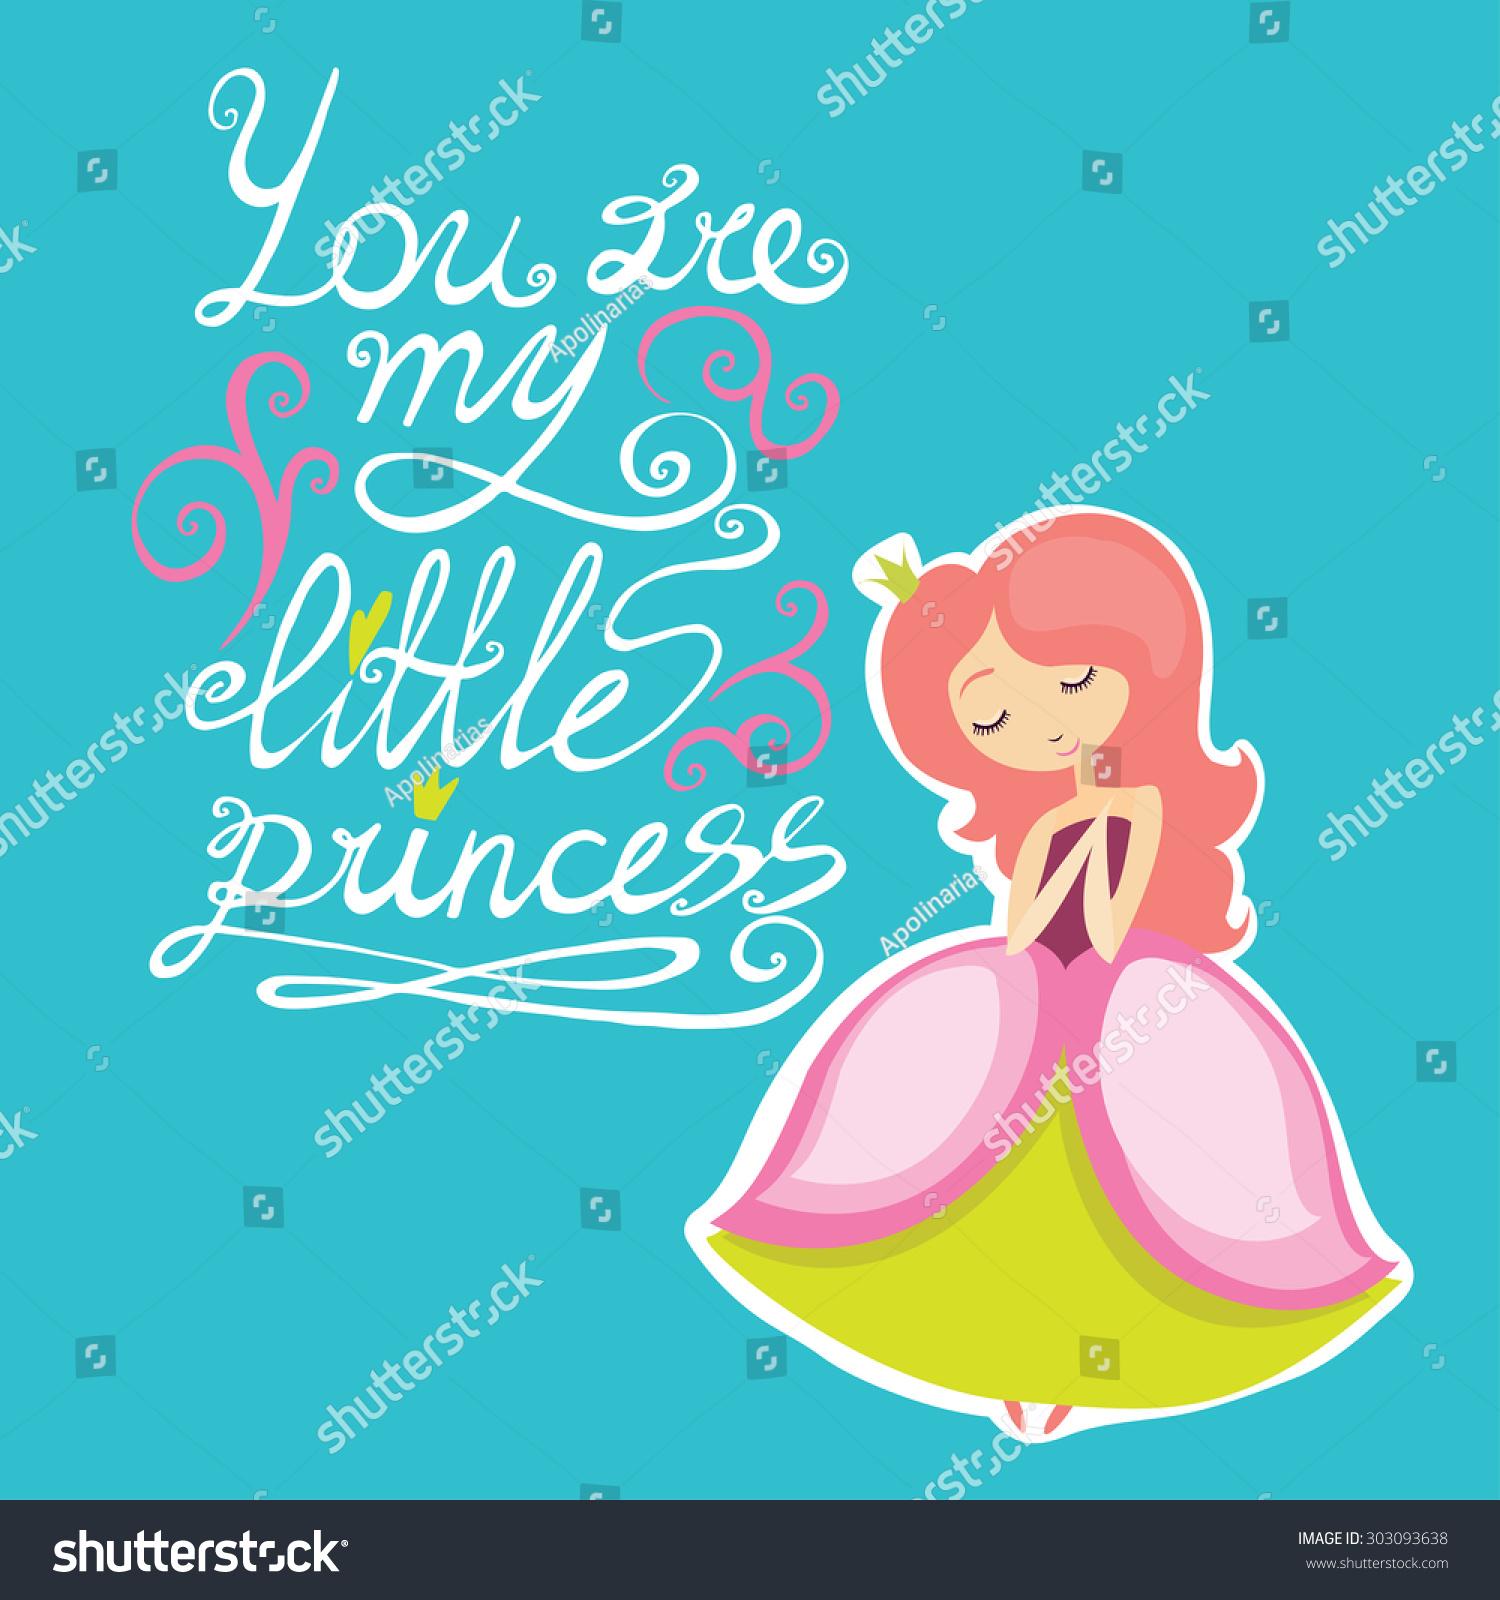 My little princess sucks like a pro 3